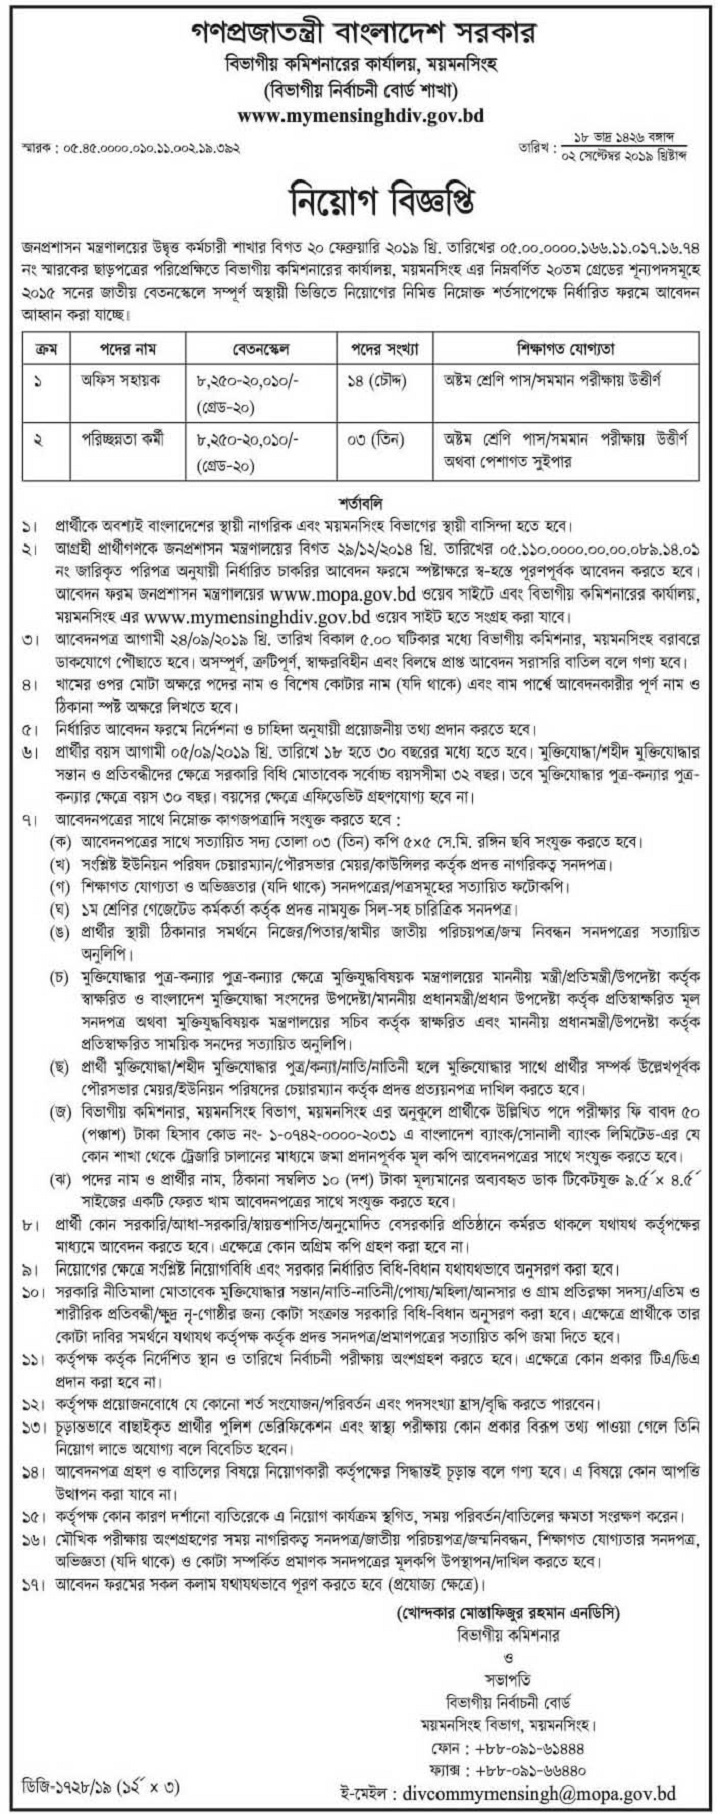 Divisional Commissioner's Office Job Circular 2019